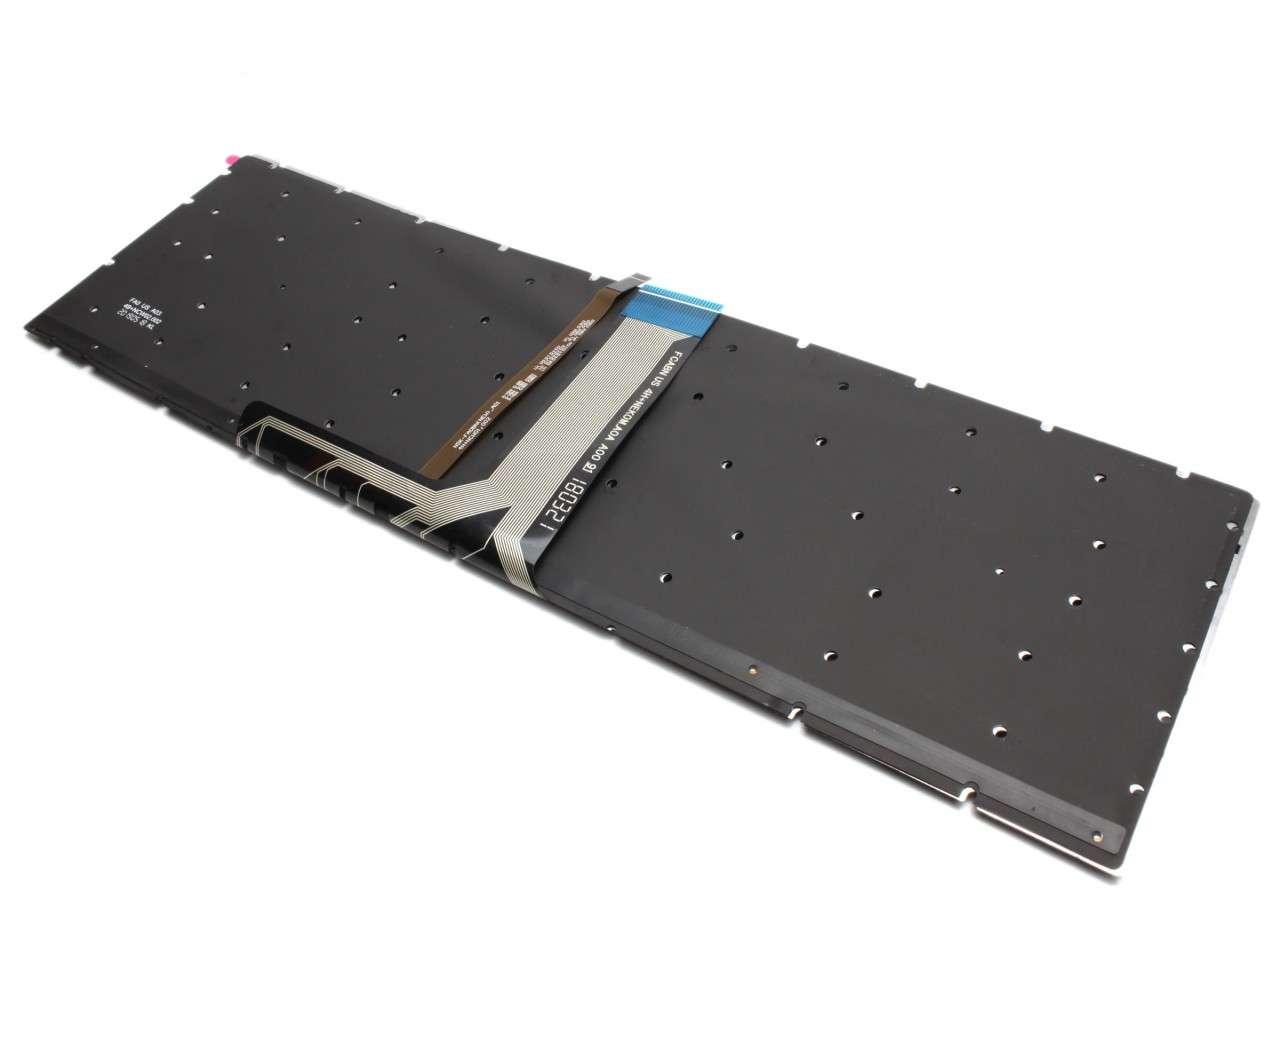 Tastatura MSI GE72 2QE Apache Pro iluminata layout US fara rama enter mic imagine powerlaptop.ro 2021